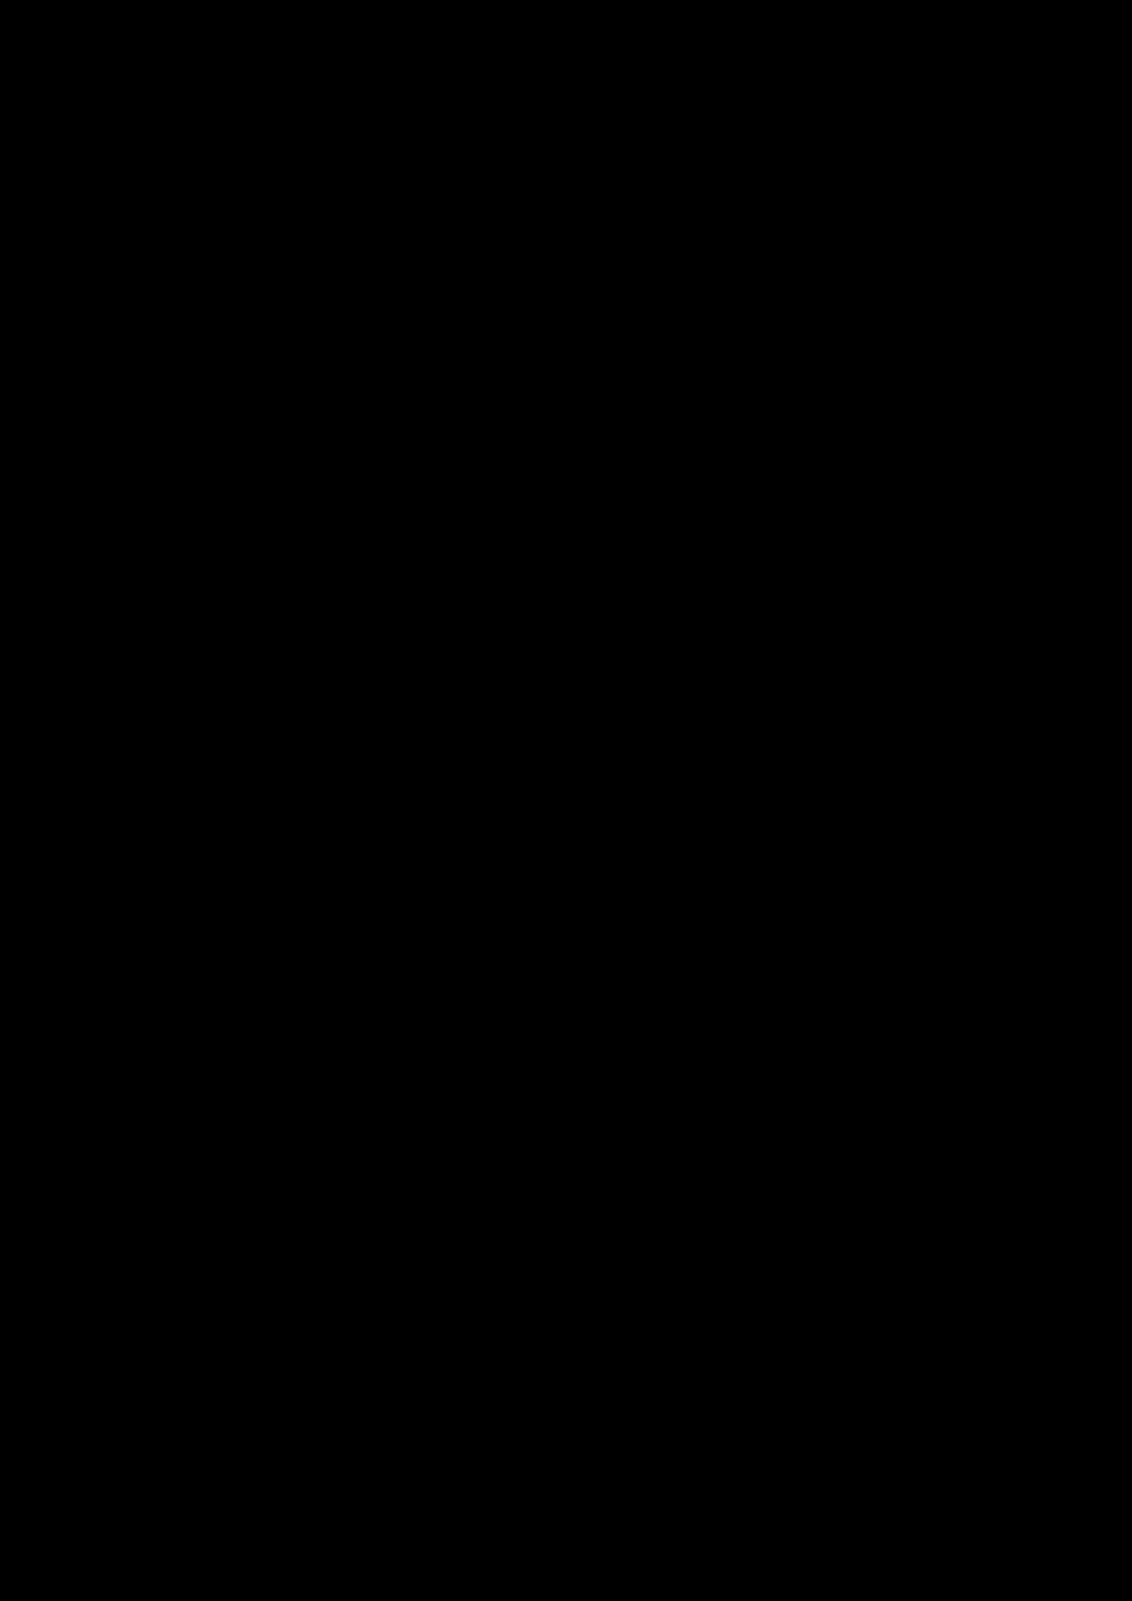 Ispoved Pervogo Boga slide, Image 69